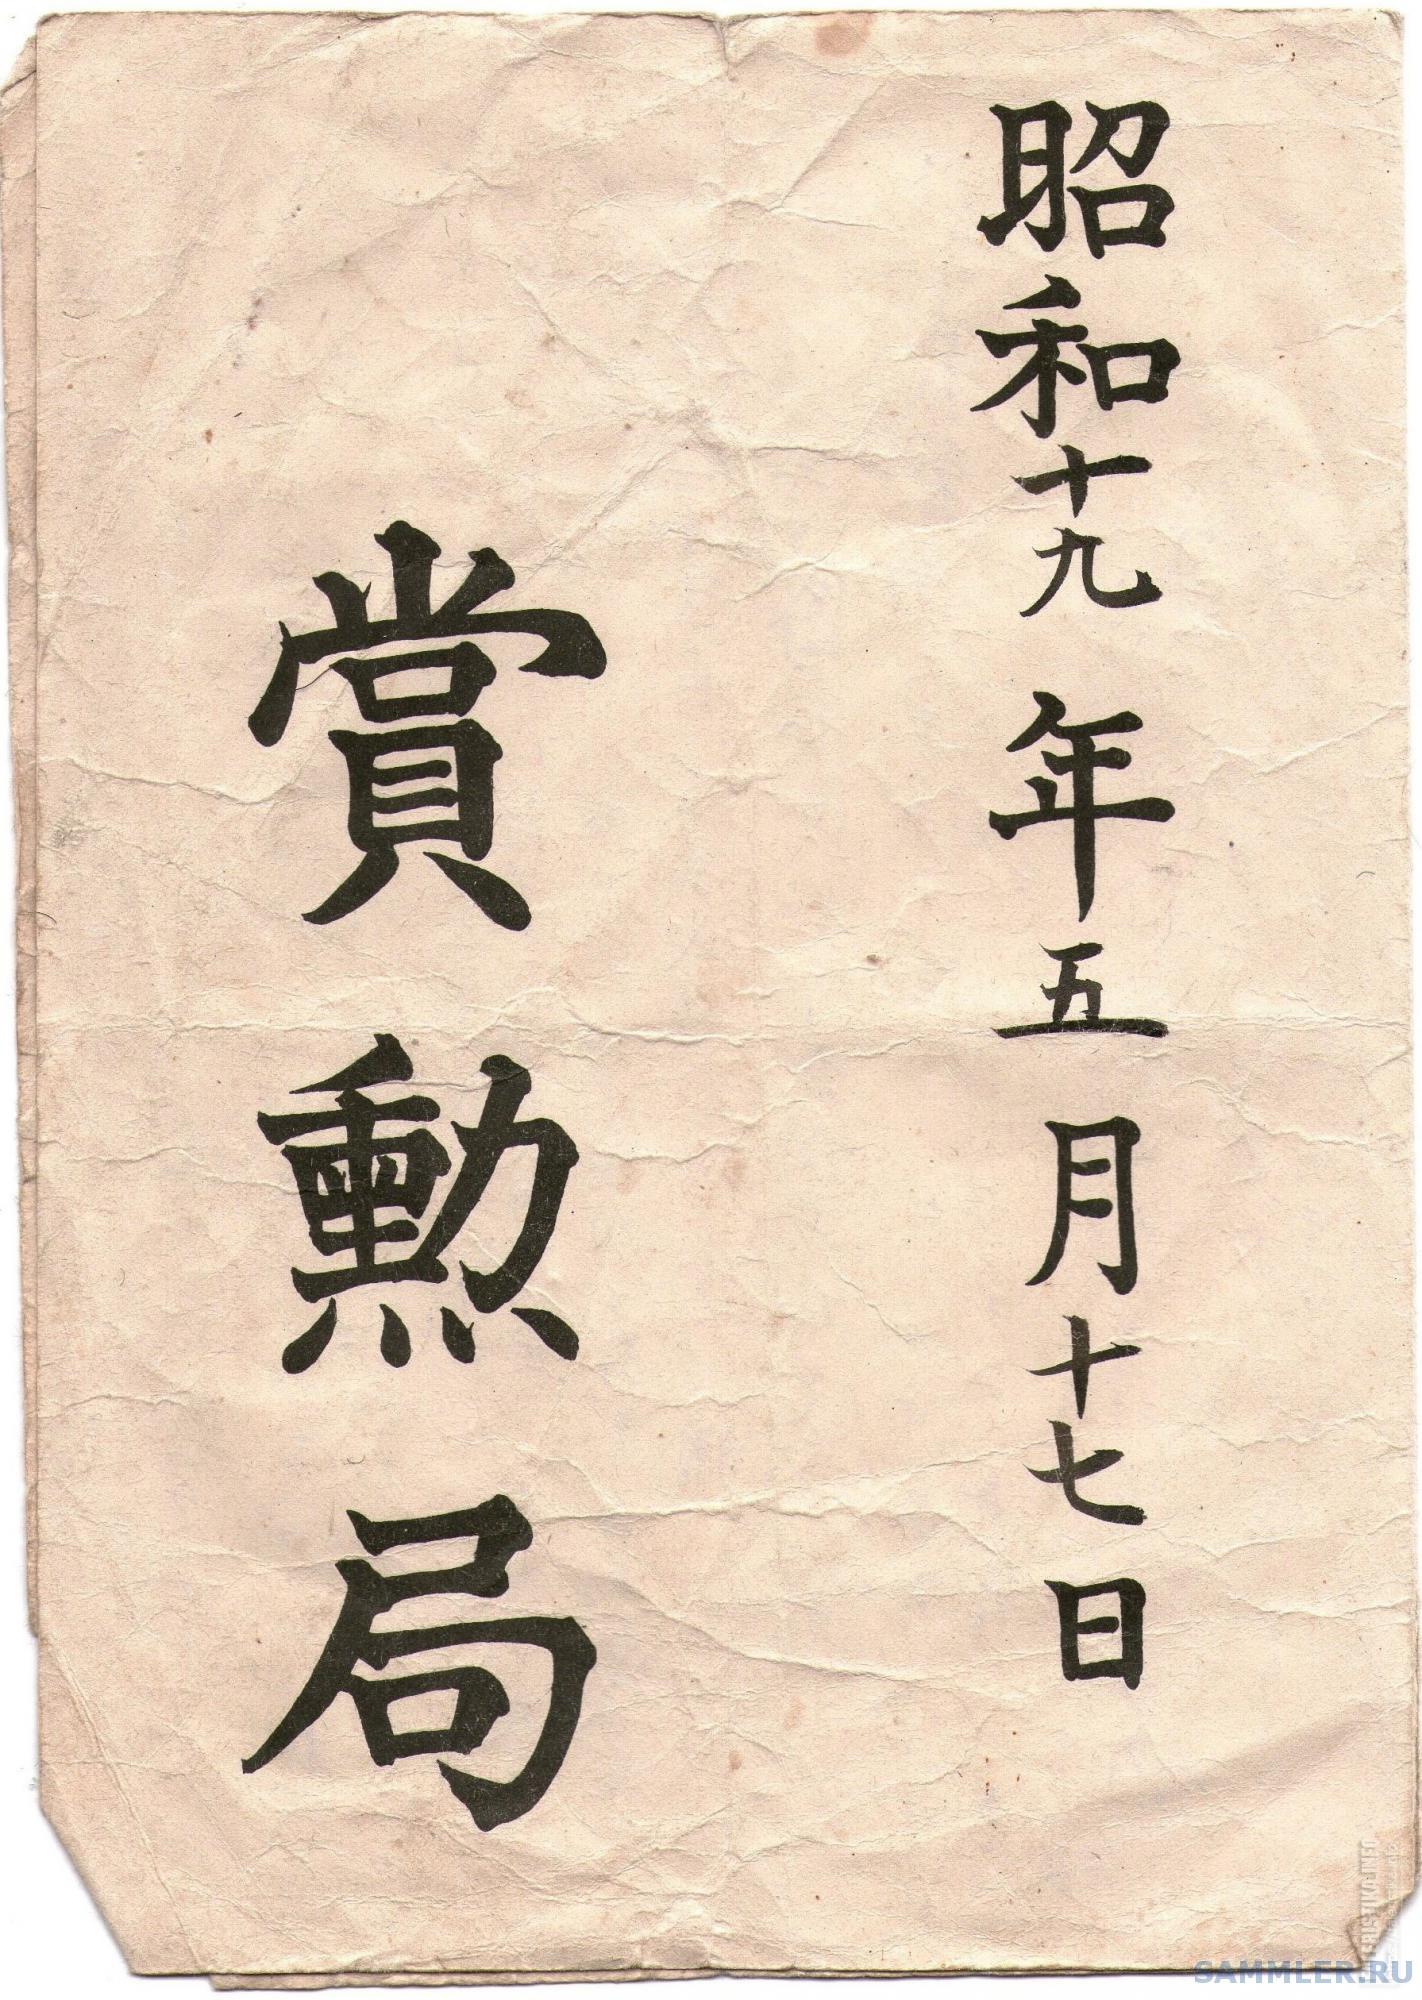 Jap004.jpg